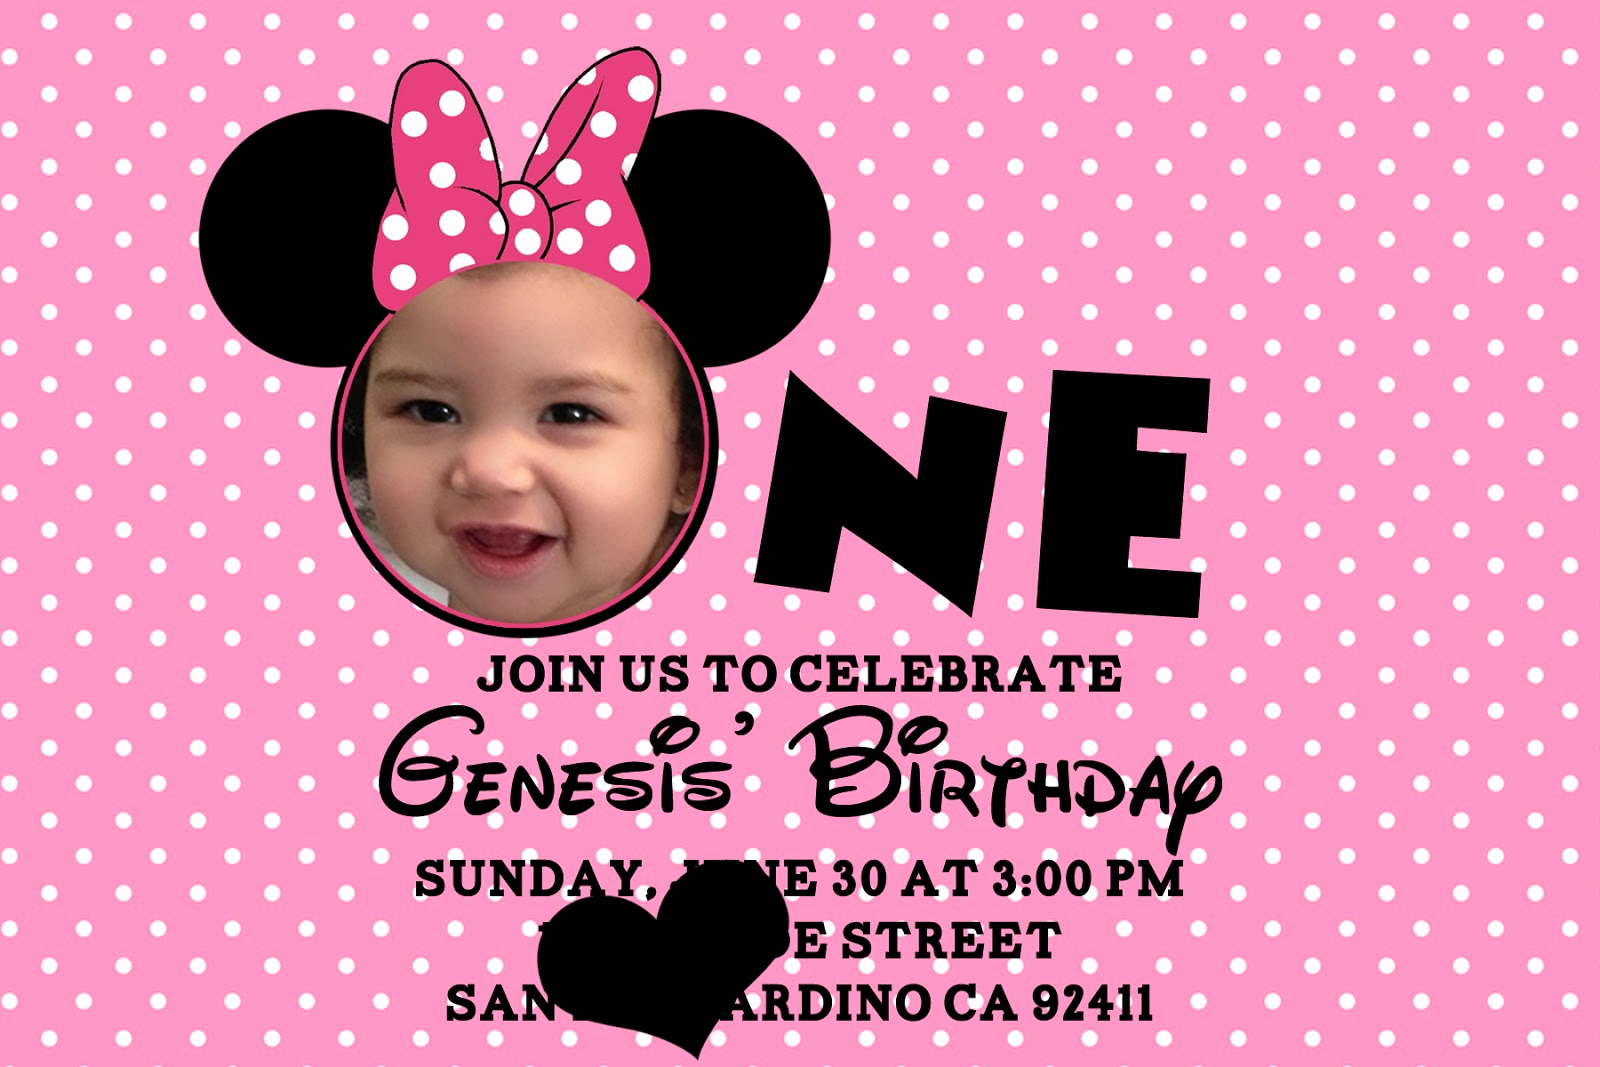 Minnie Mouse Invitation Template Free Unique Printable Minnie Mouse Birthday Invitations – Bagvania